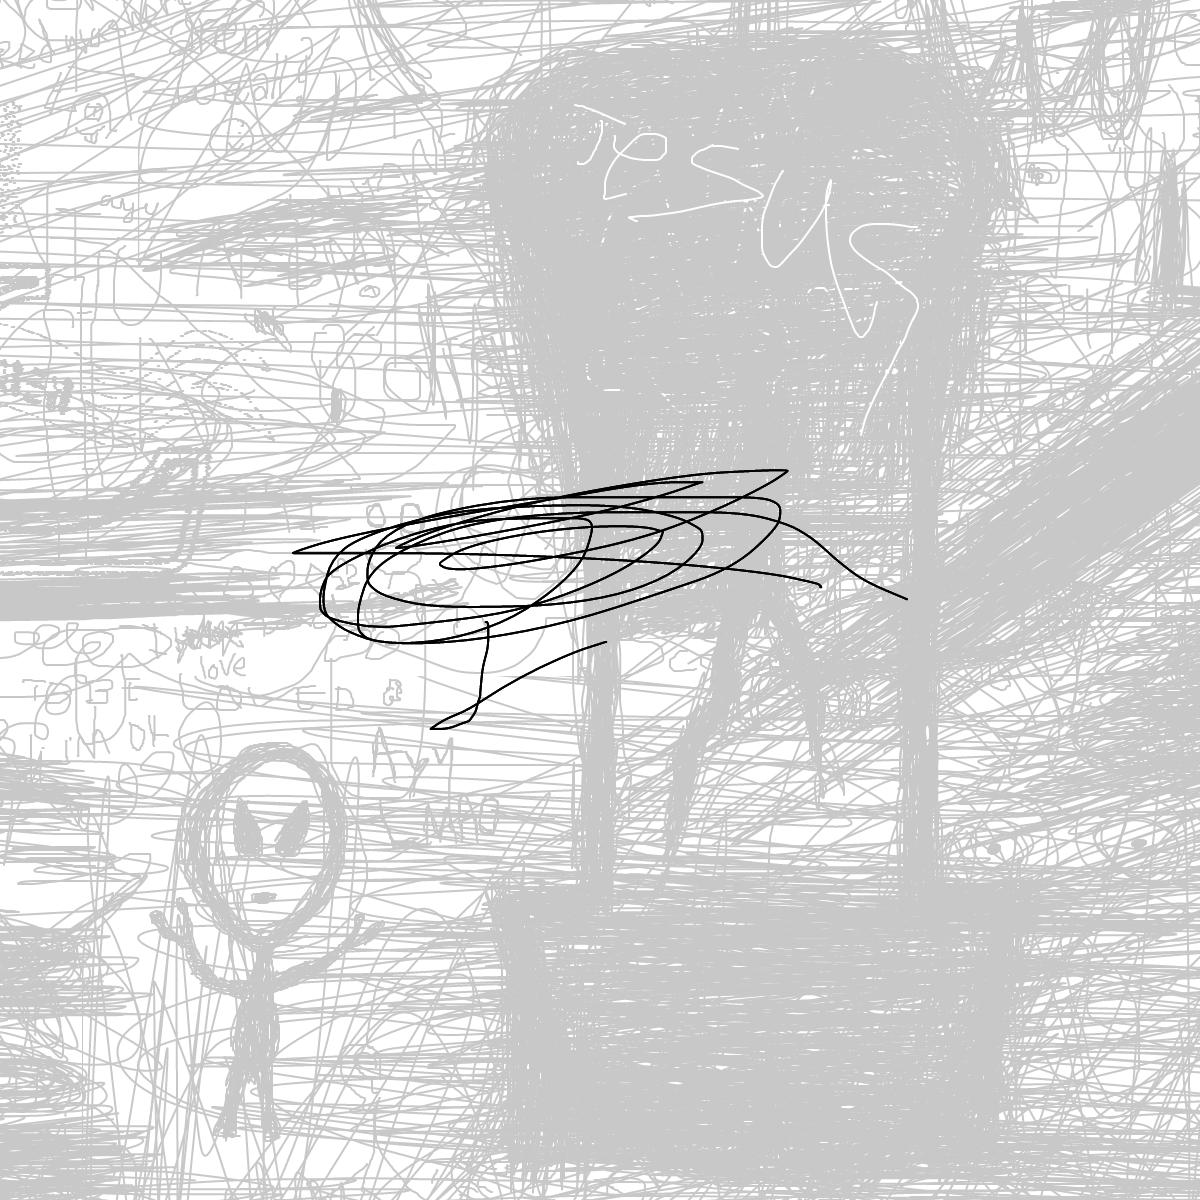 BAAAM drawing#23402 lat:52.4751930236816400lng: 13.4069194793701170